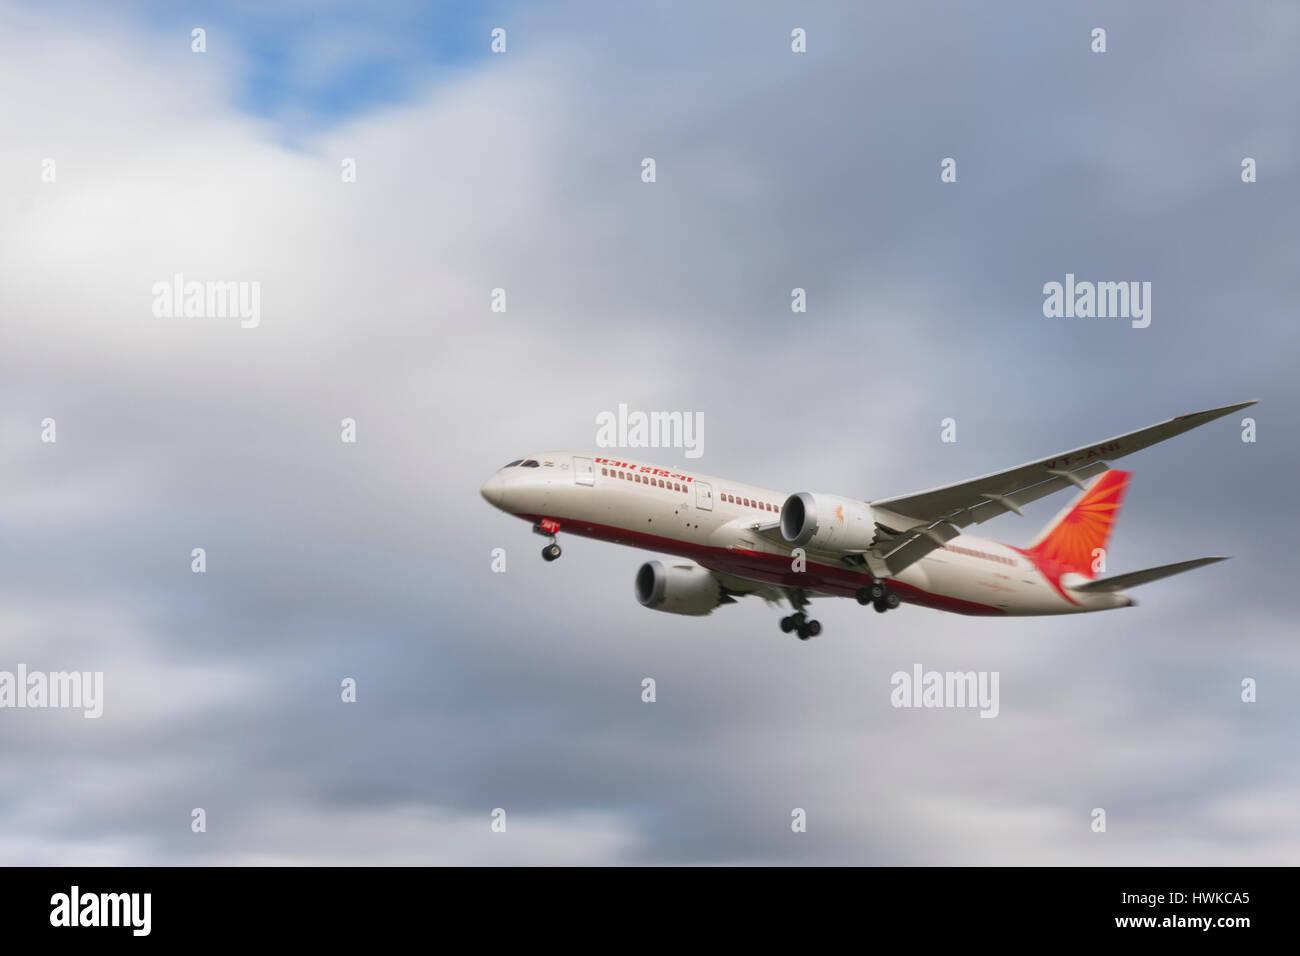 Air India Boeing 787-8 Dreamliner landing at London Heathrow Airport, UK - Stock Image